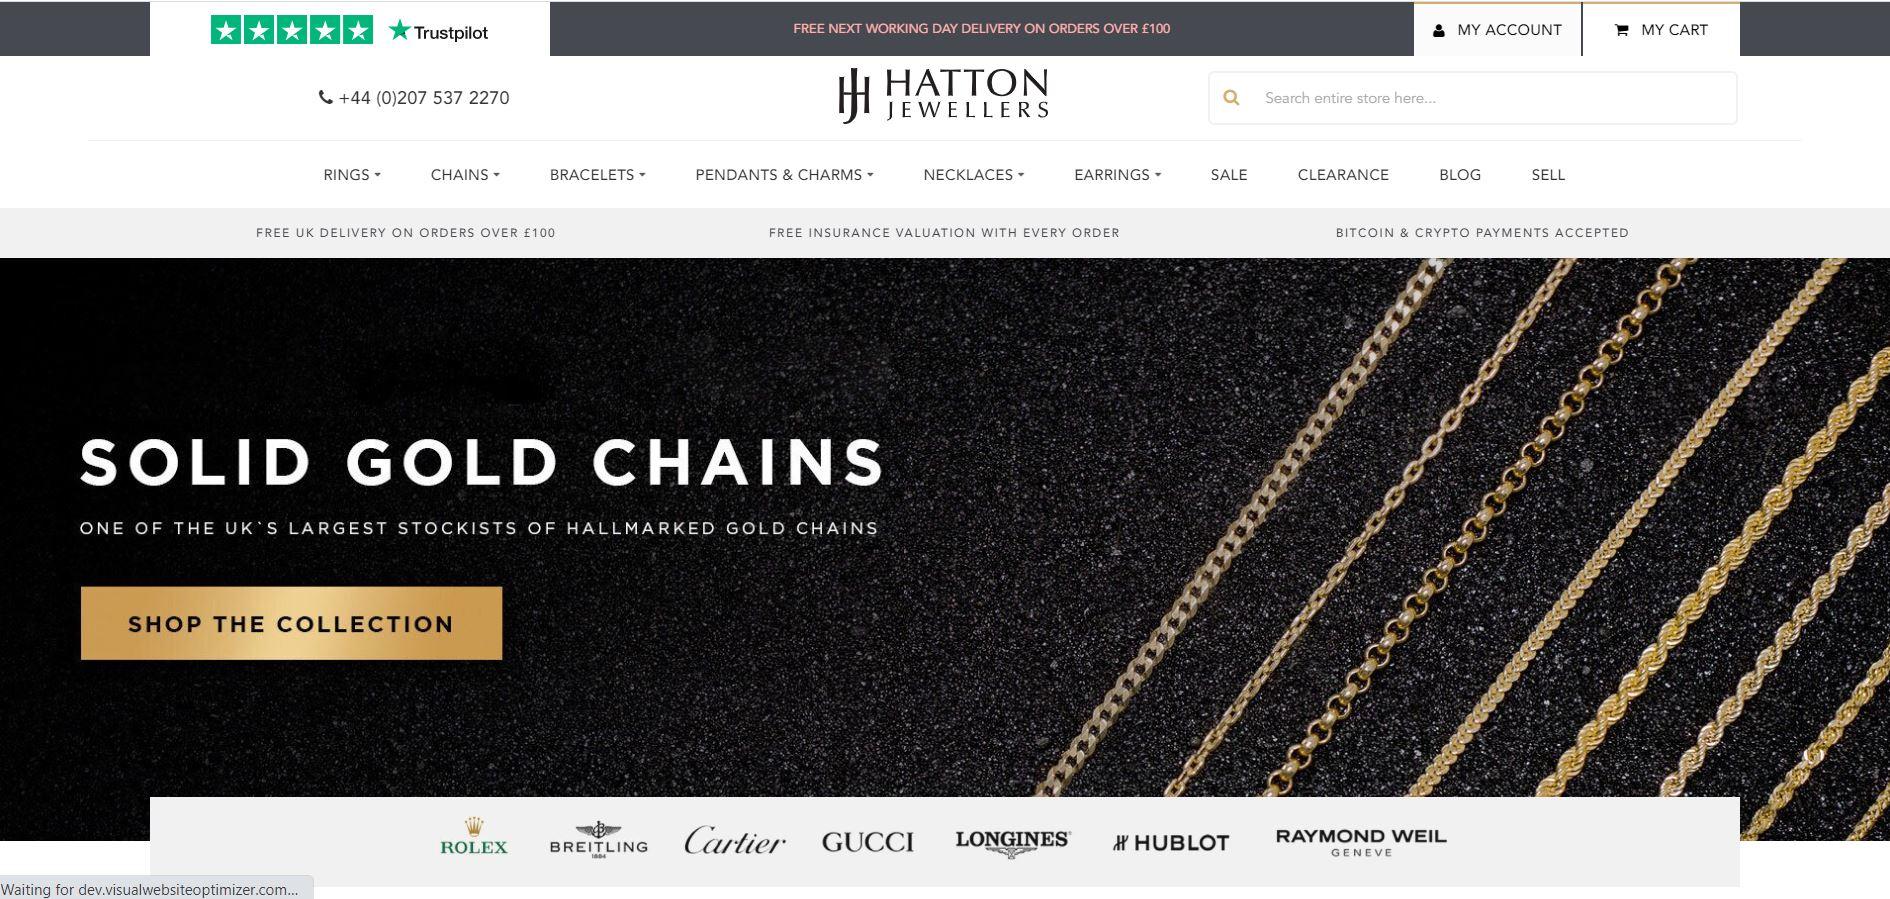 Hatton Jewelers